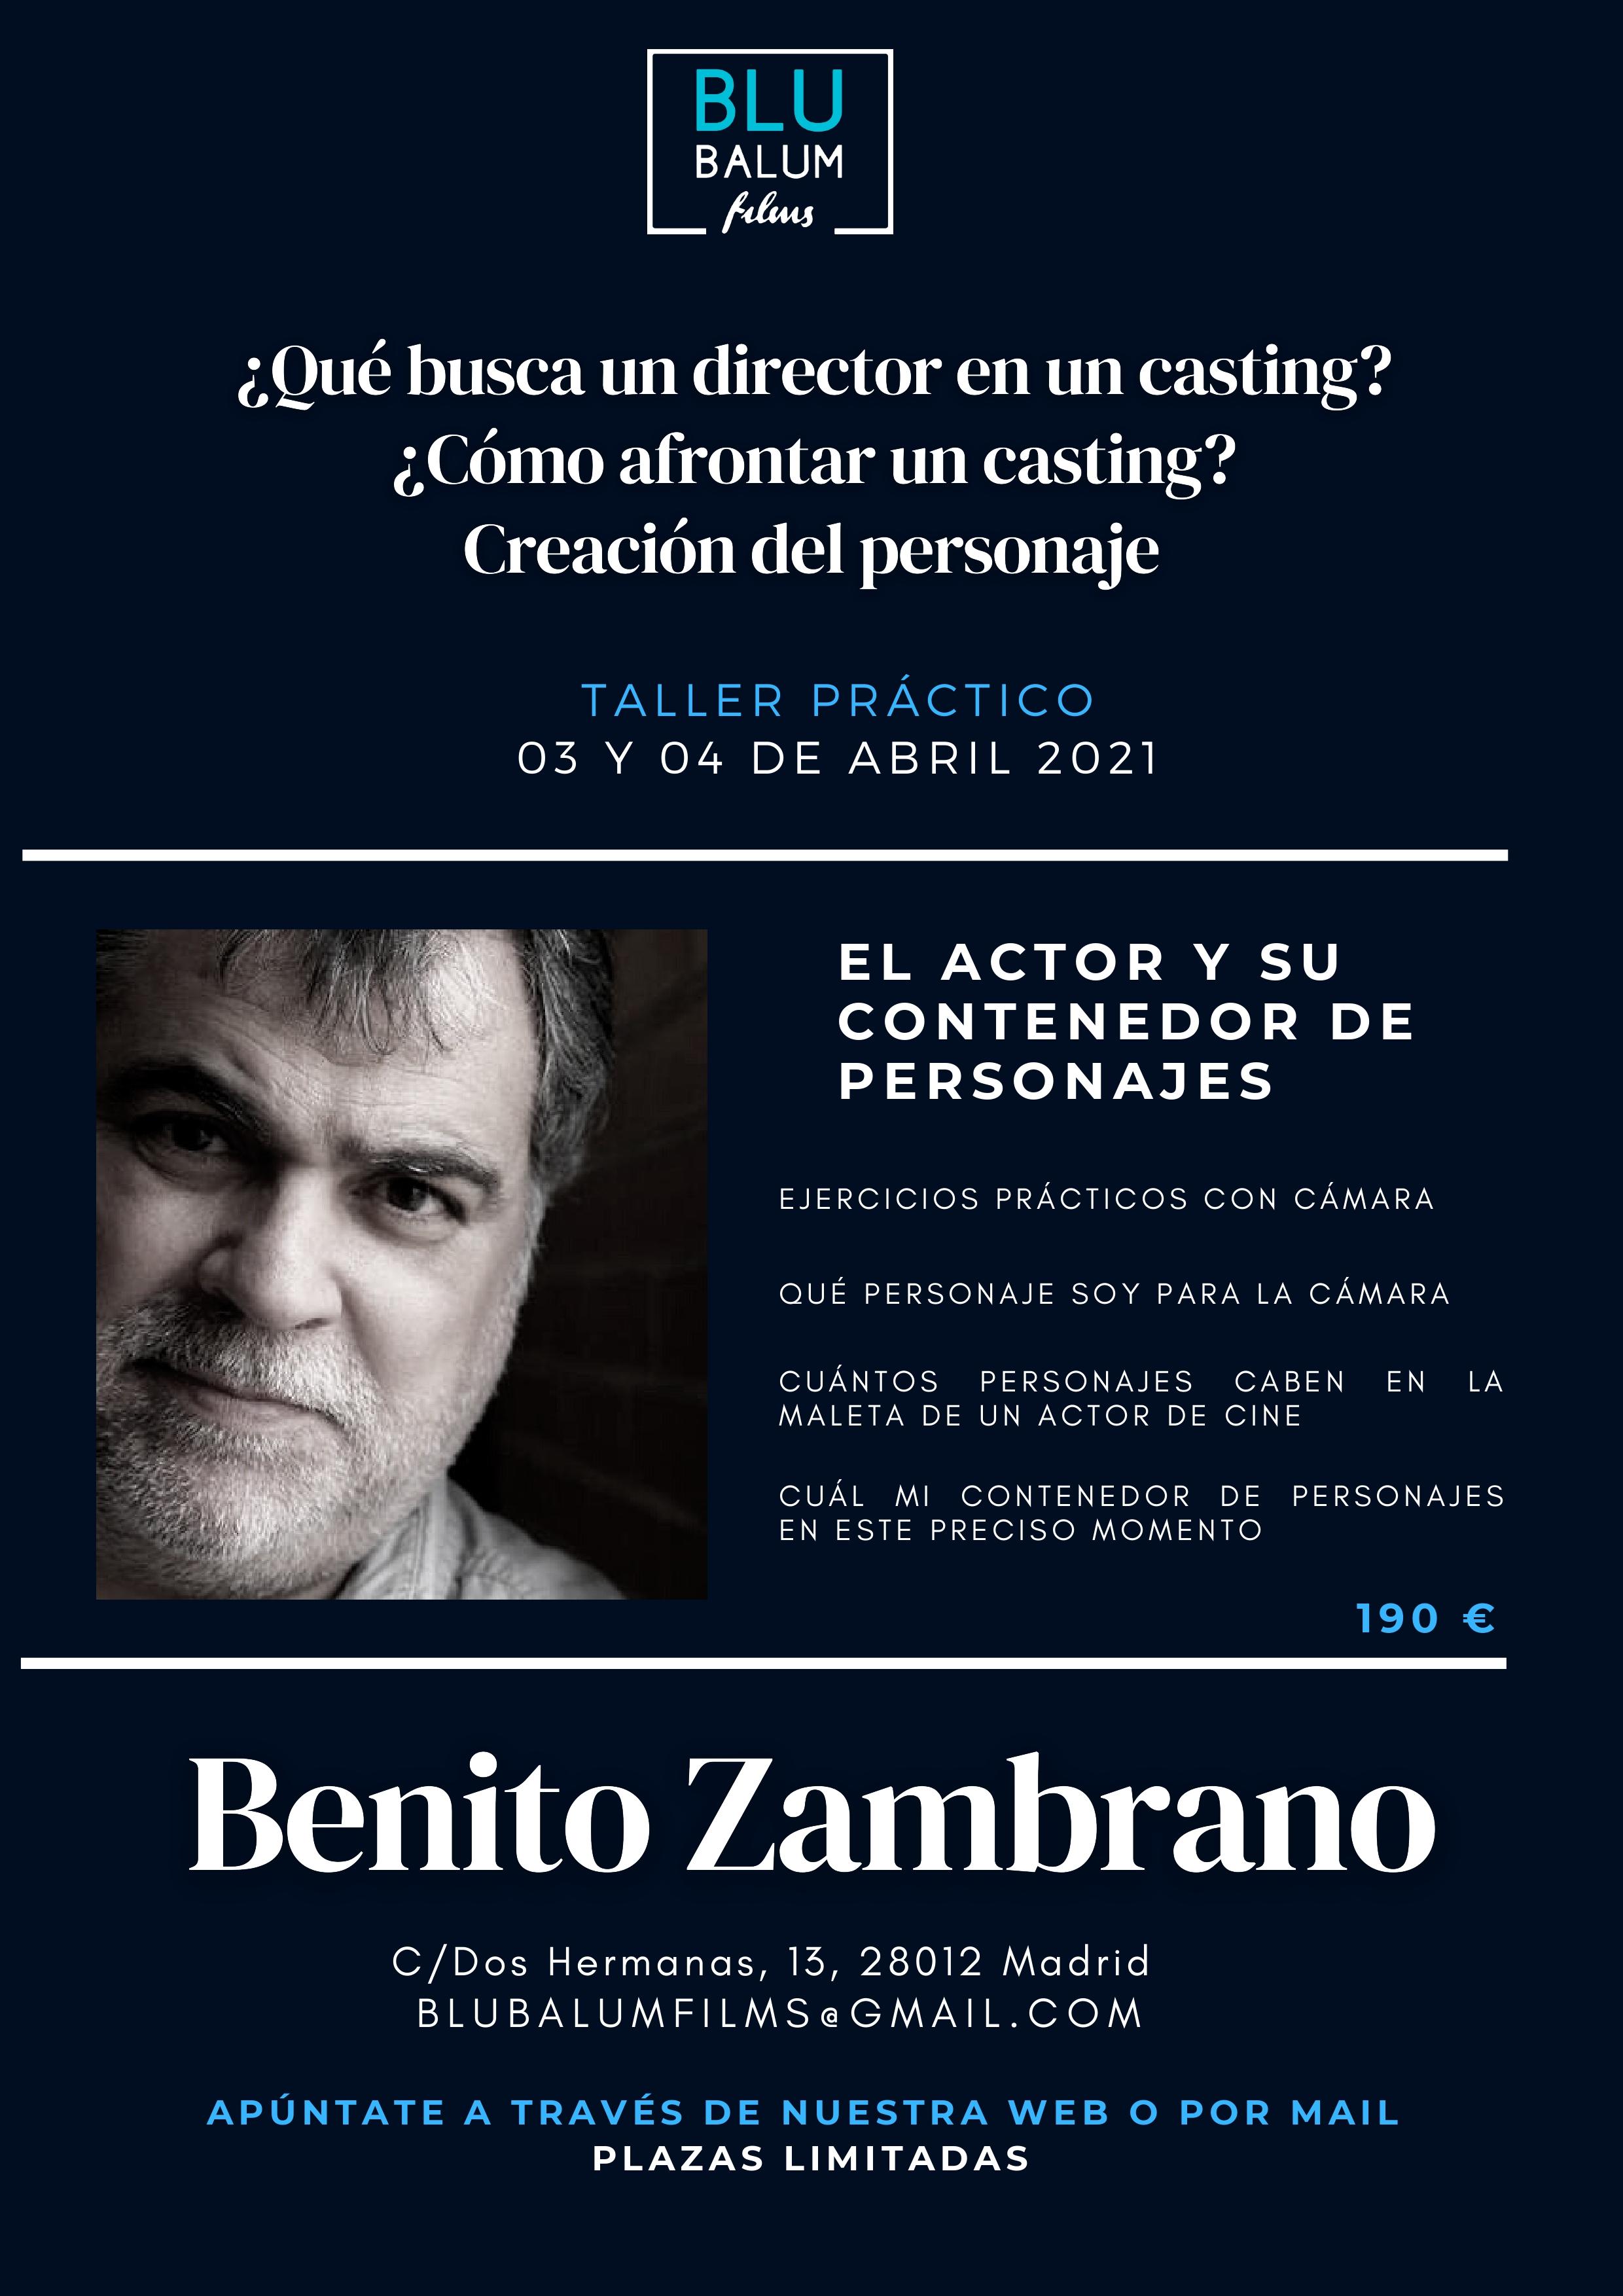 Benito Zambrano - Preparación al casting